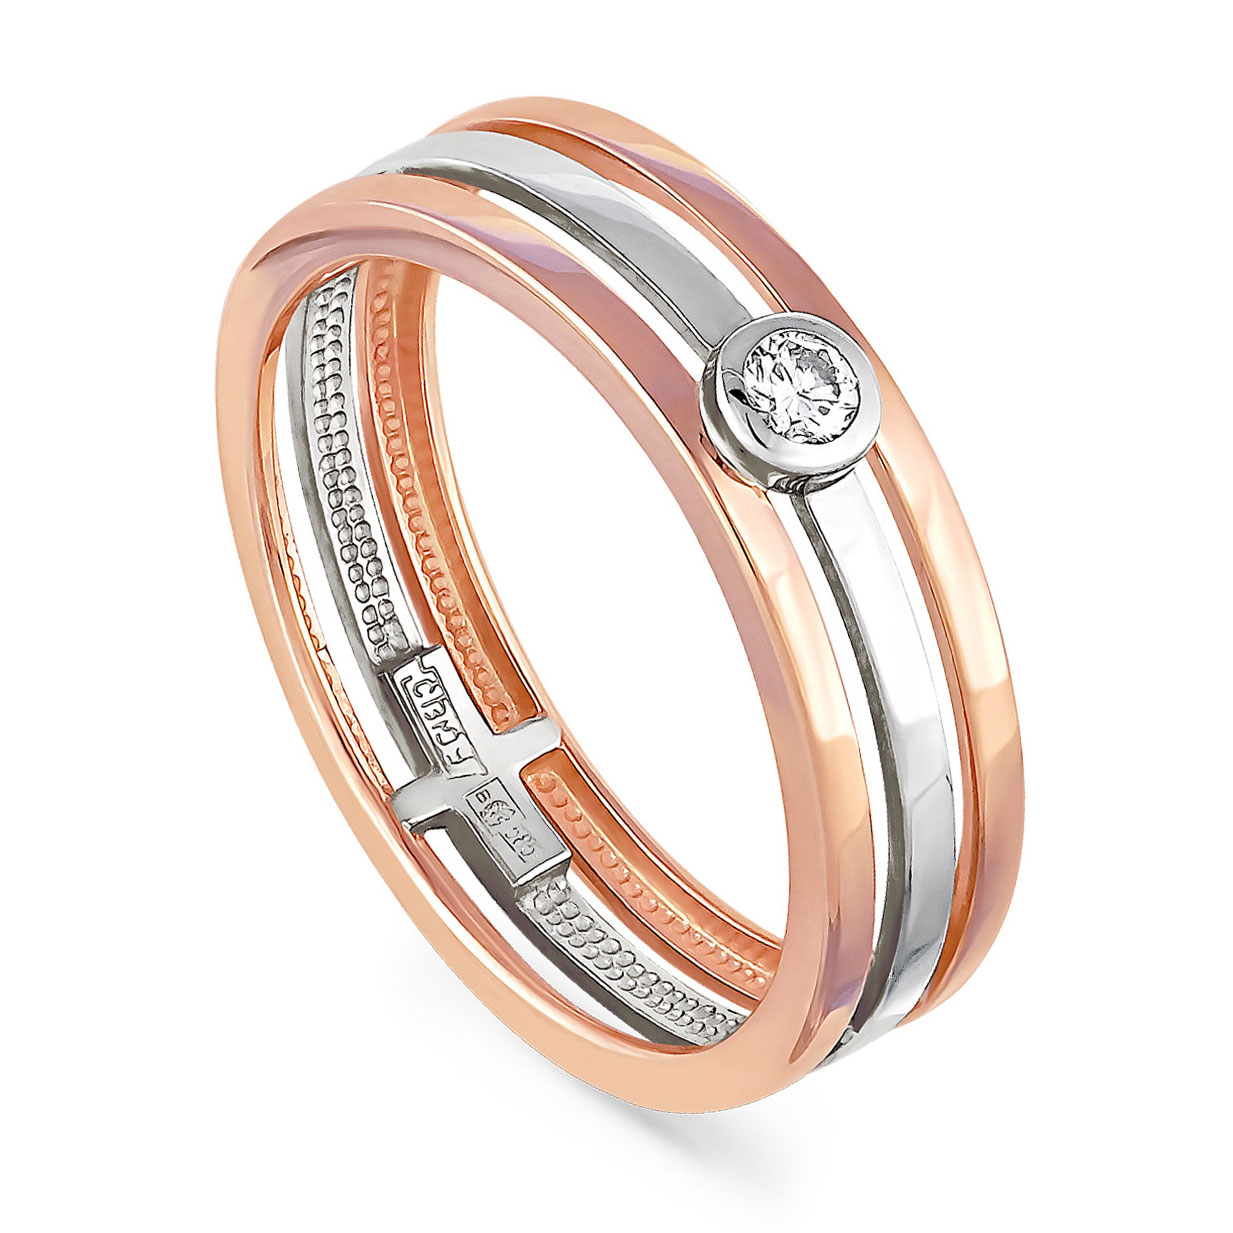 Золотое кольцо Бриллиант арт. 1-0359-1000 1-0359-1000